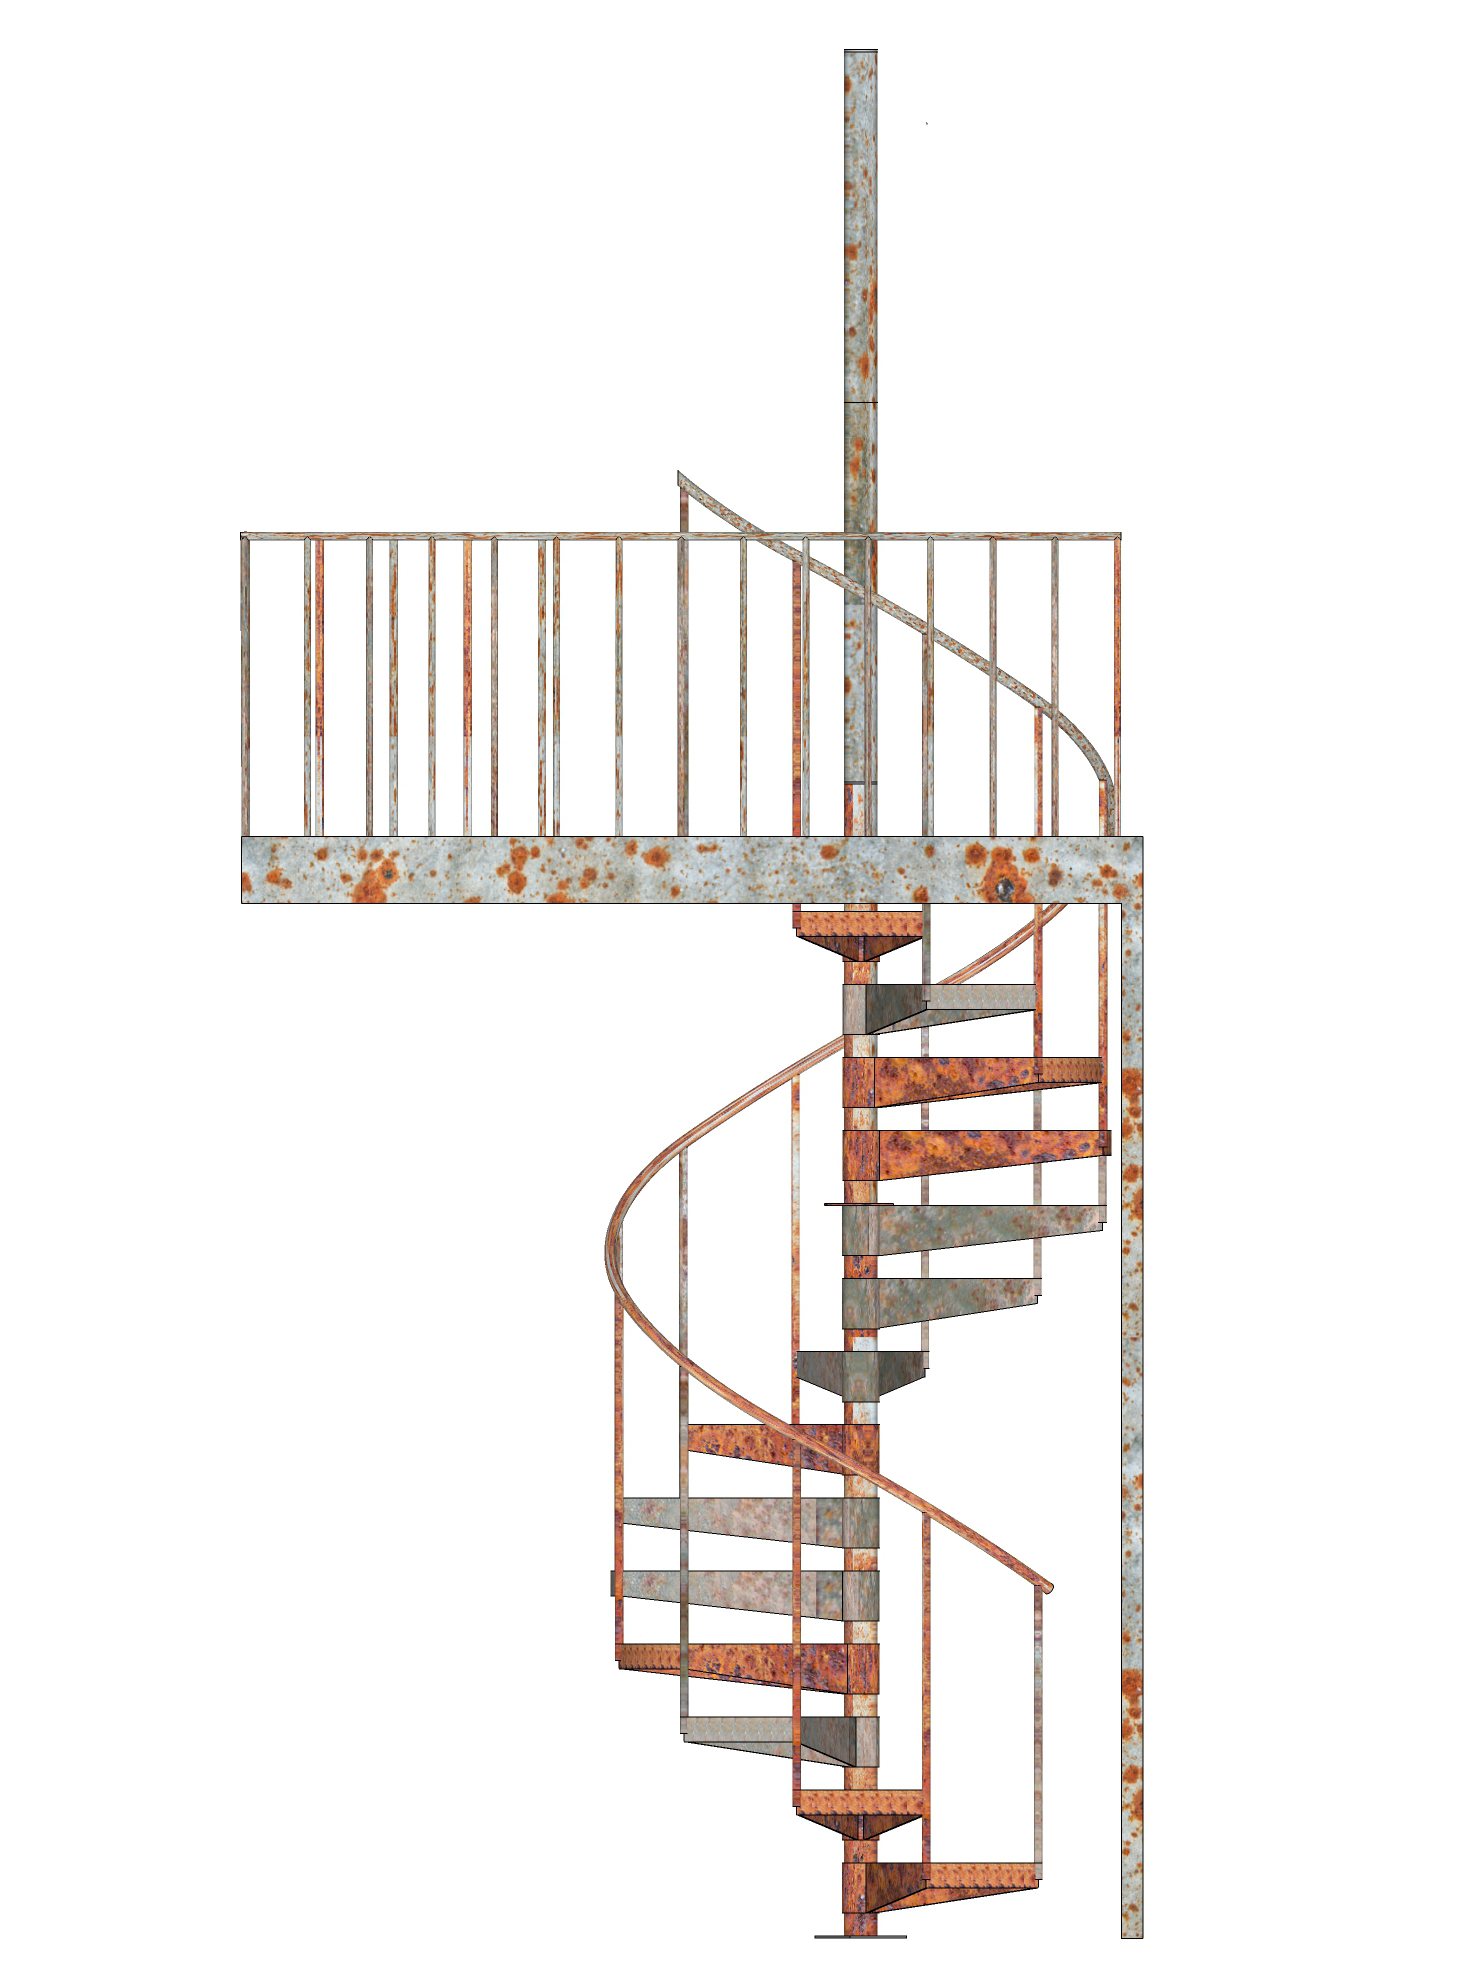 LSOH Fire Escape Design - ELEVATION 4.jpg